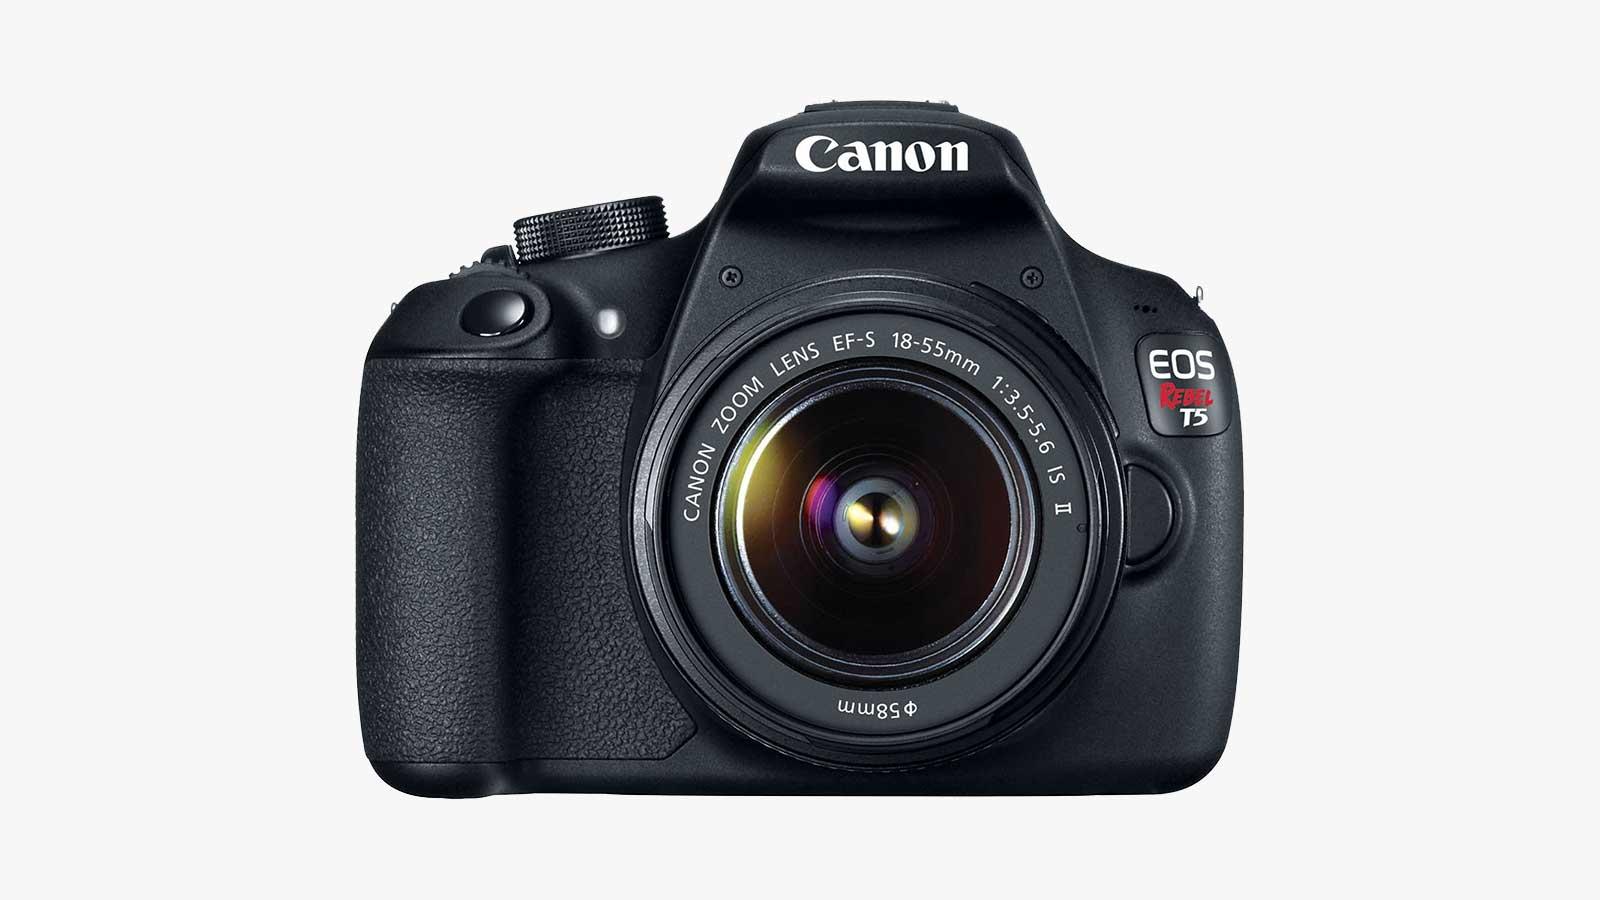 Canon Rebel T5 DSLR Camera